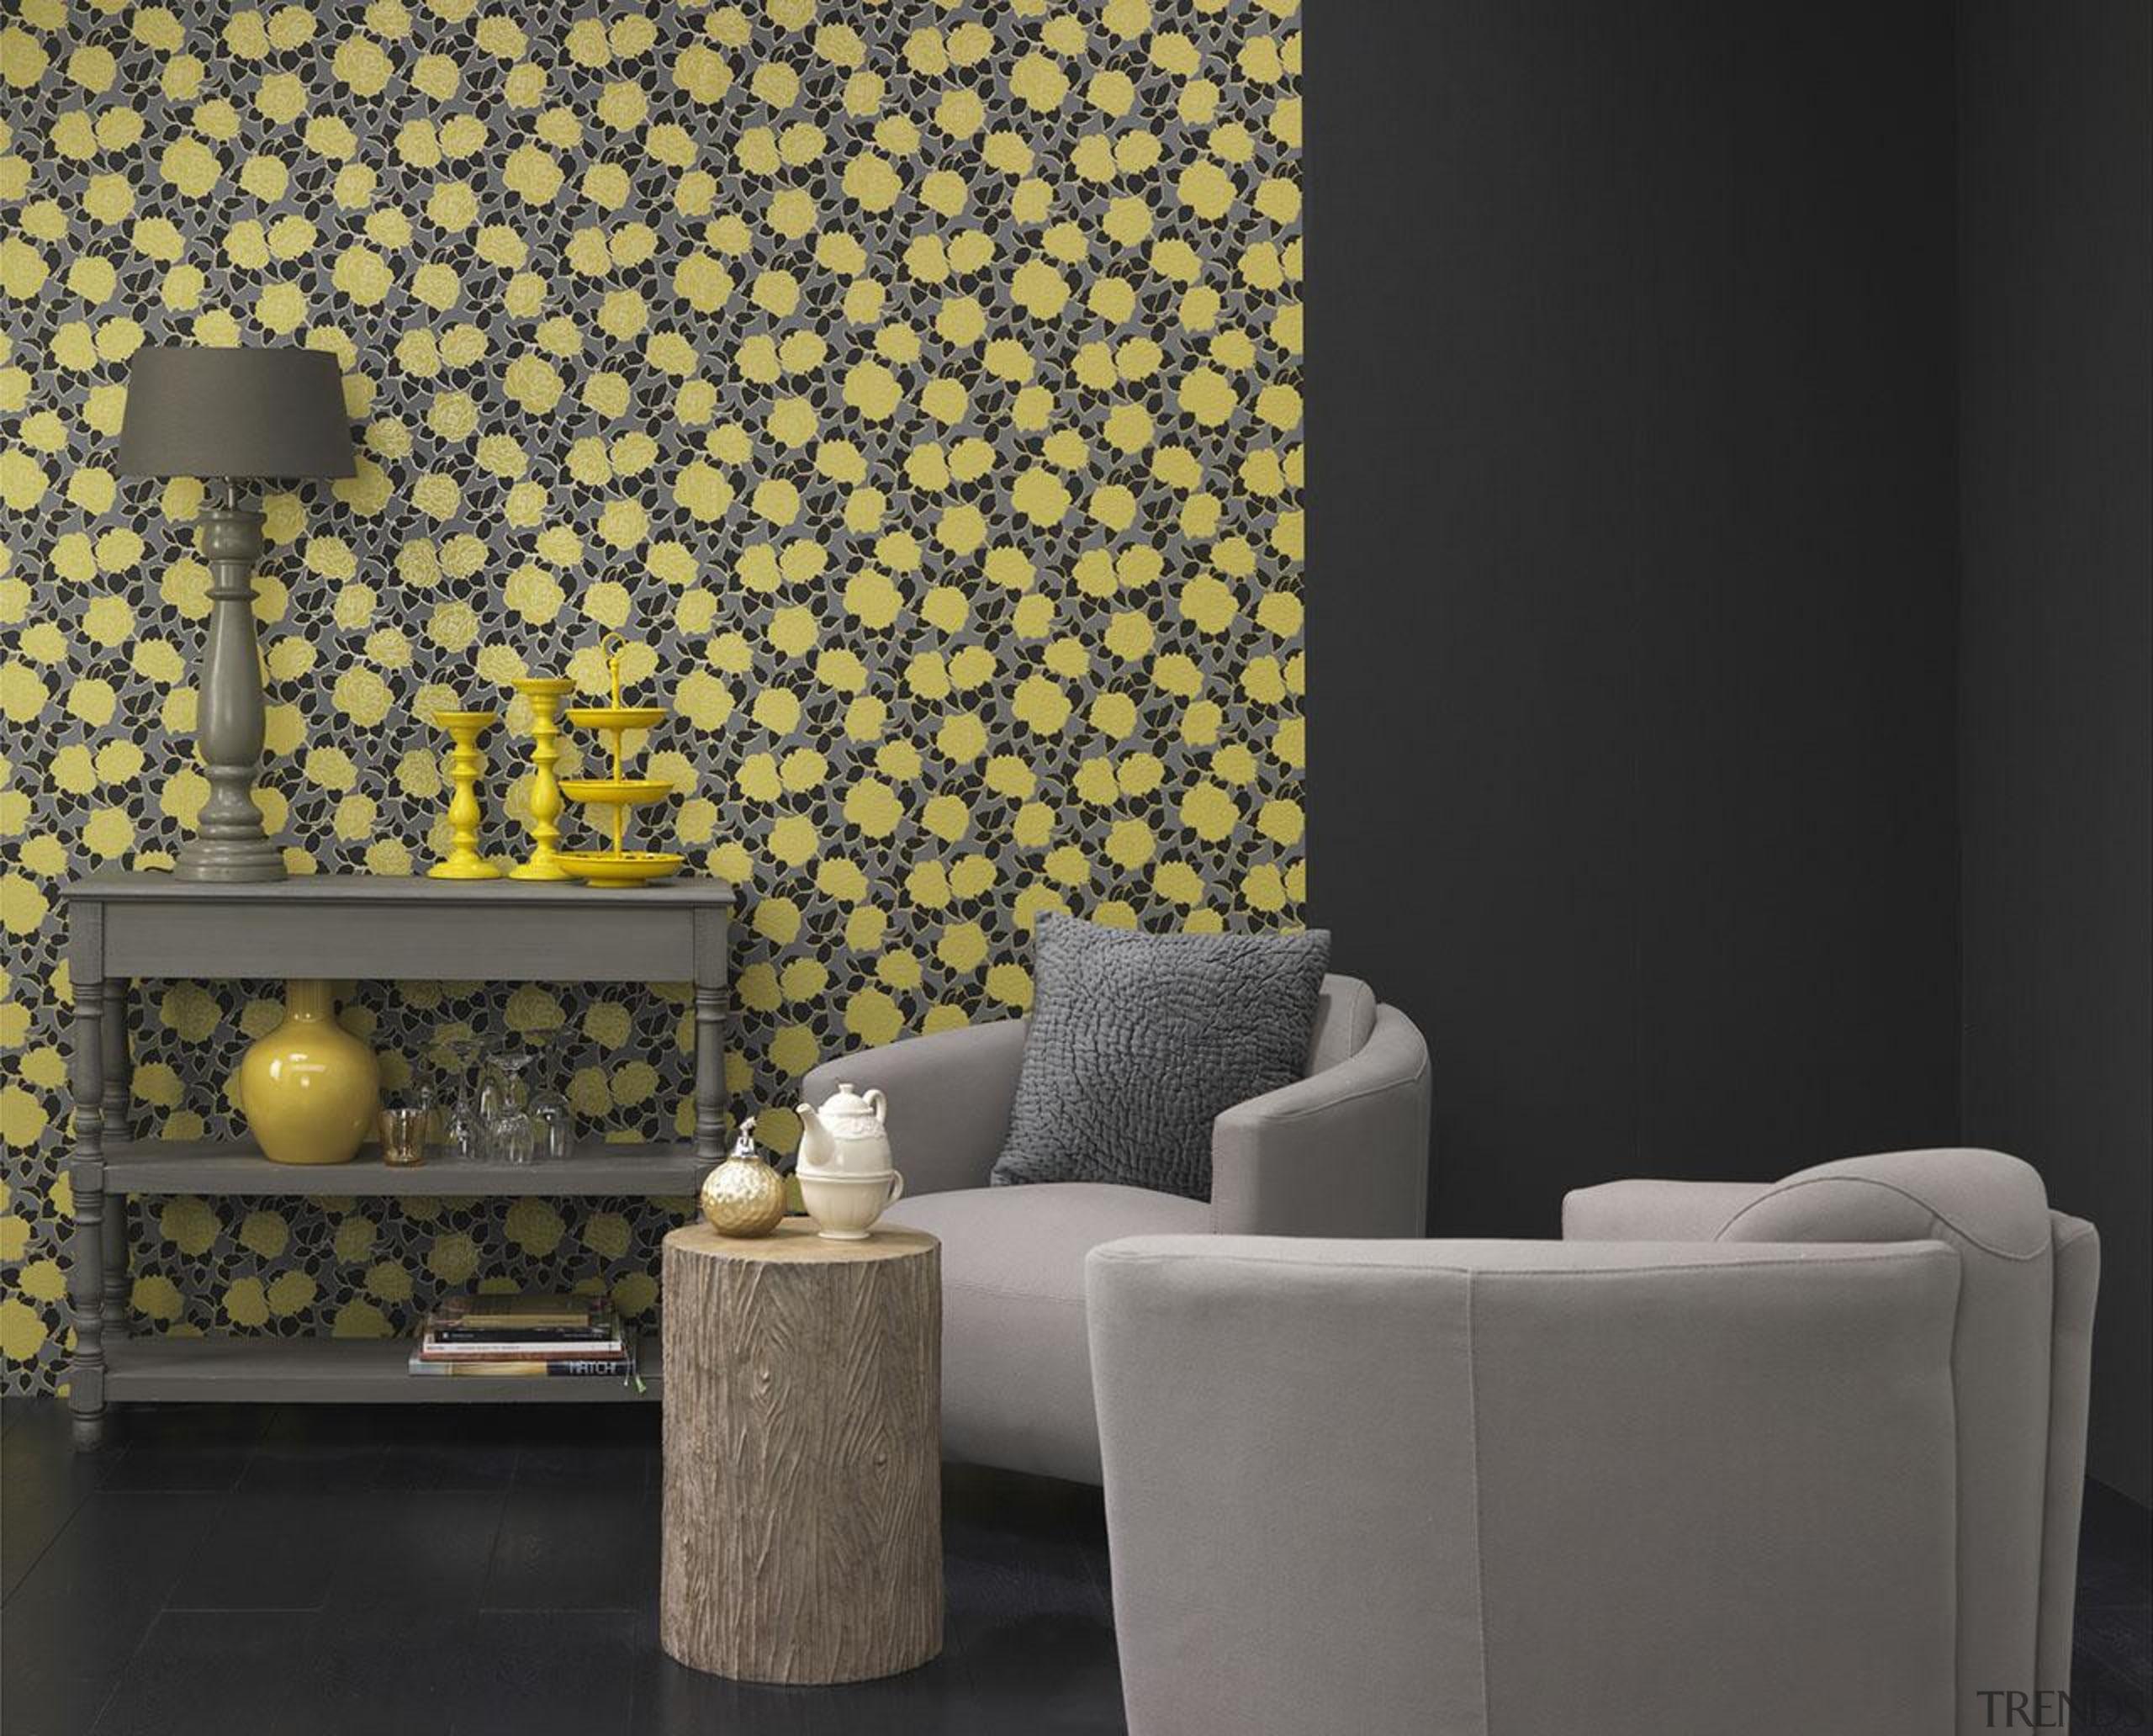 Brocante II Range - Brocante II Range - interior design, living room, product design, wall, wallpaper, yellow, black, gray